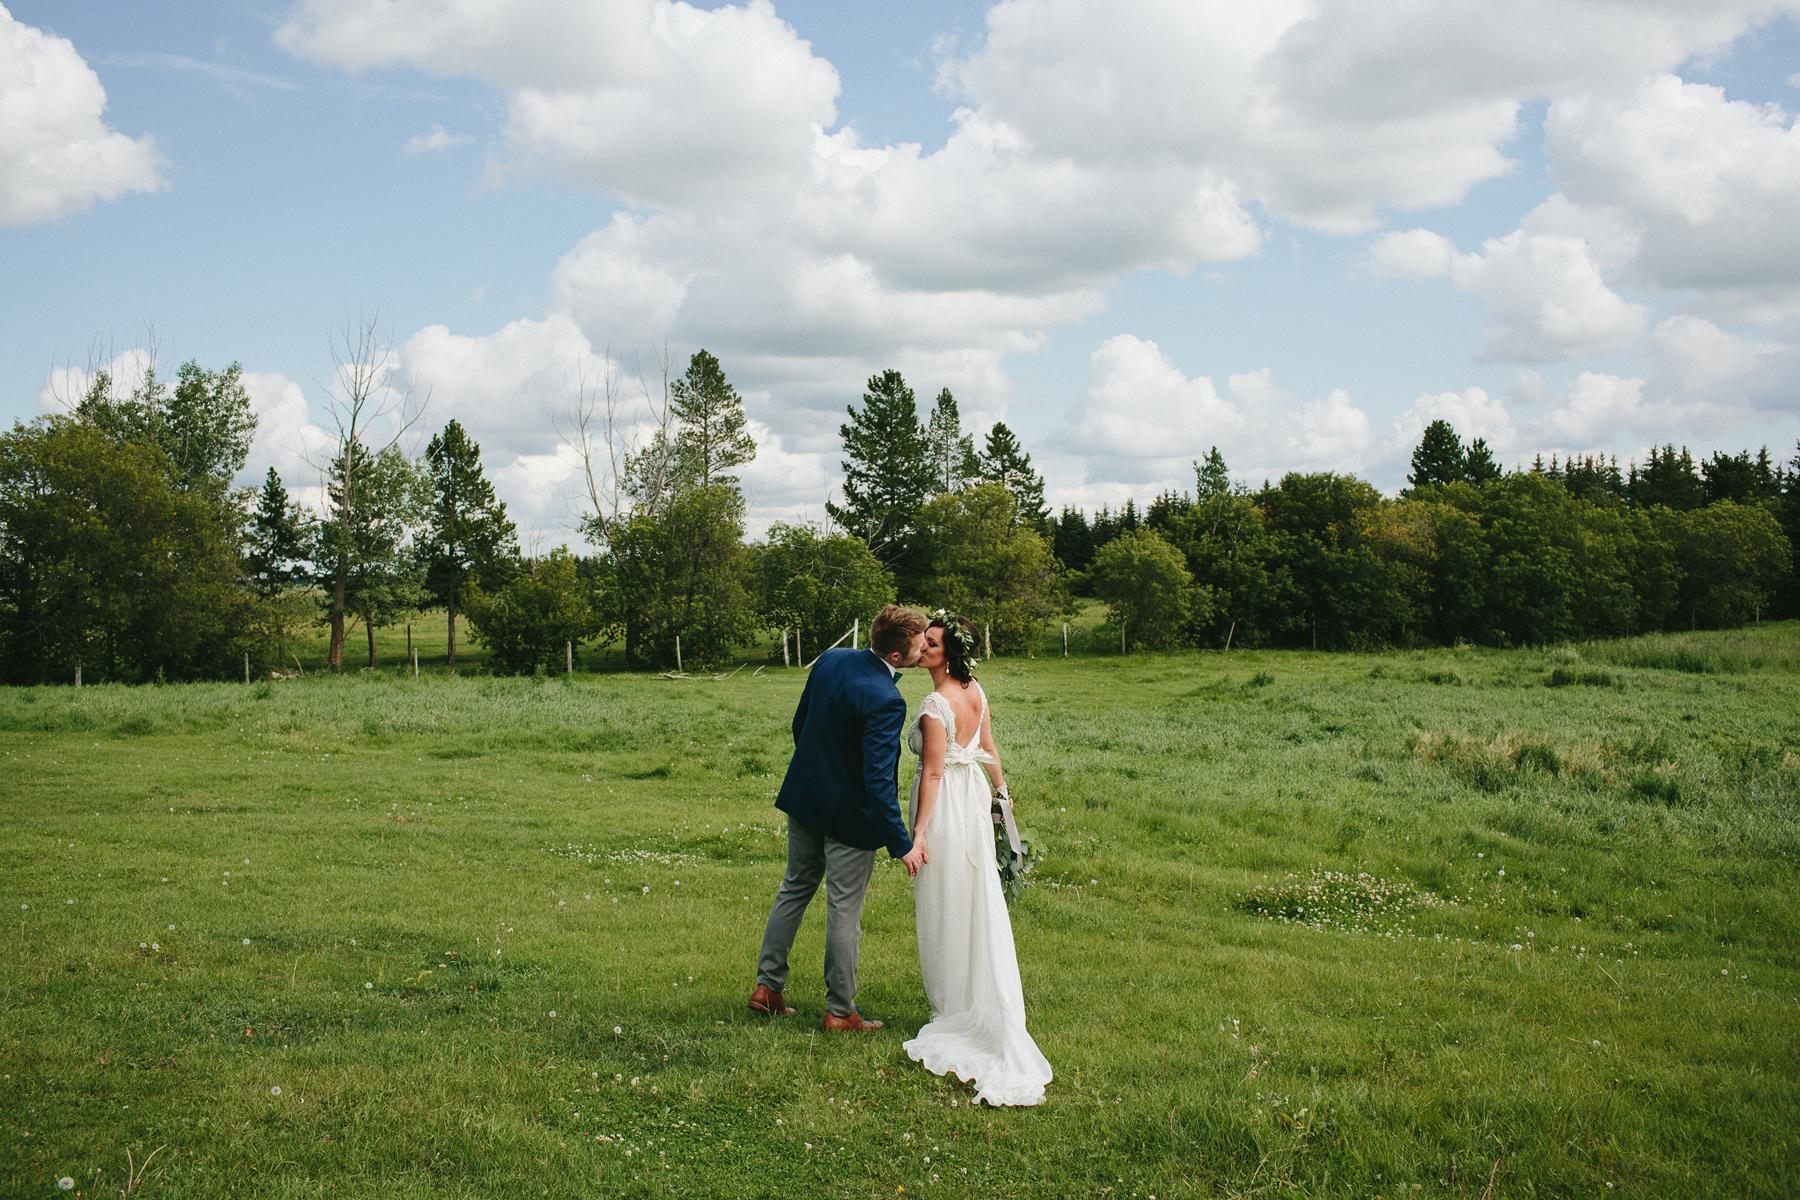 alberta-farm-wedding-photographer-rp-wj-076.jpg